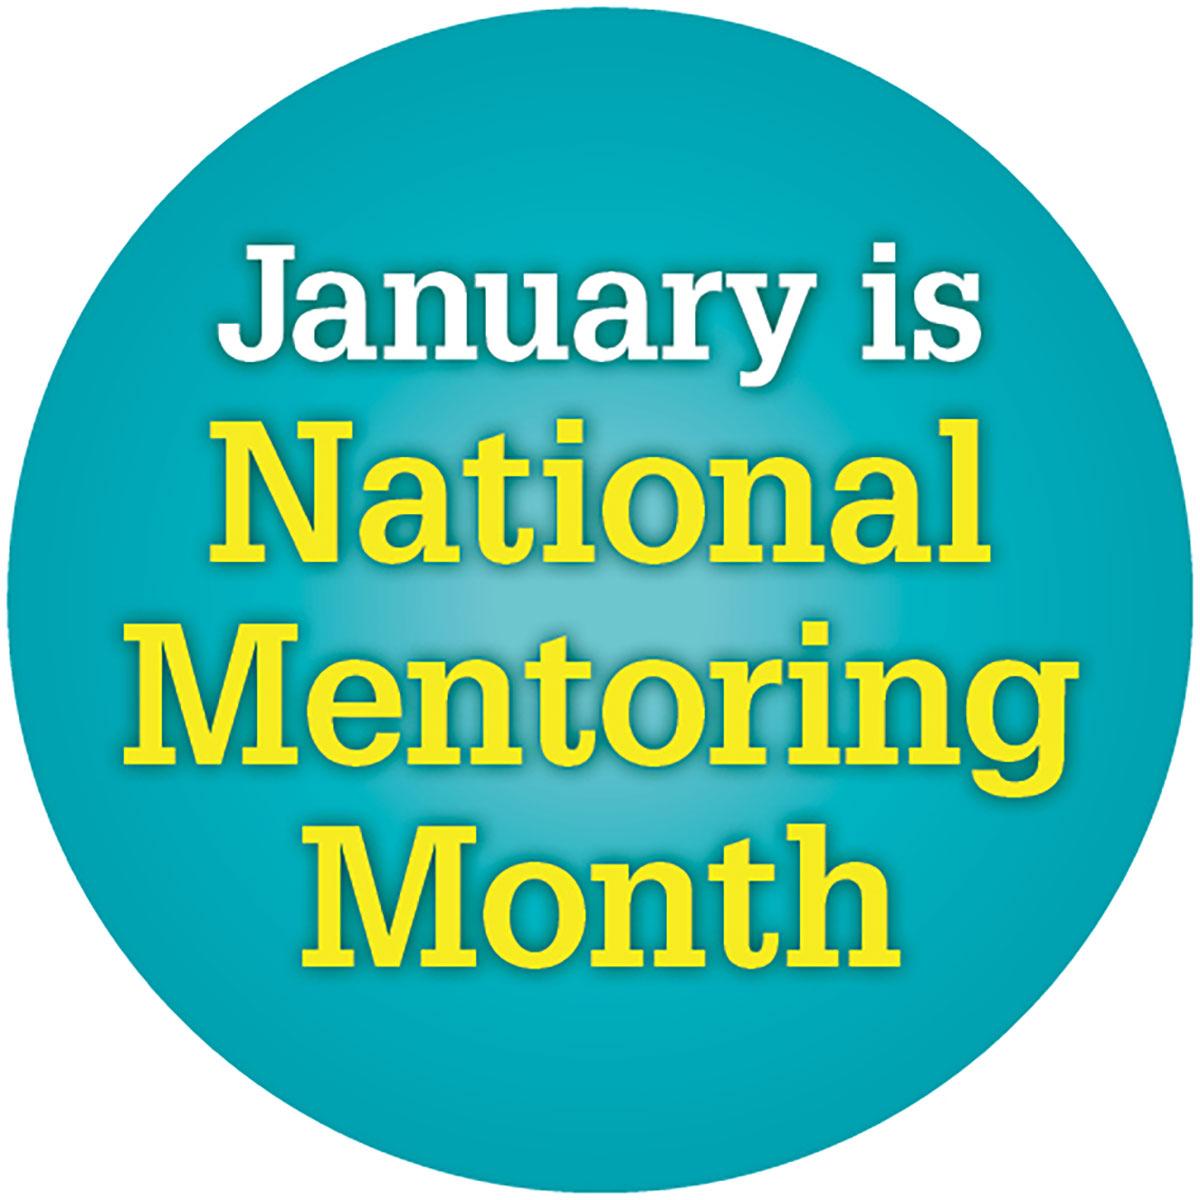 Big Brothers Big Sisters Celebrates National Mentoring Month